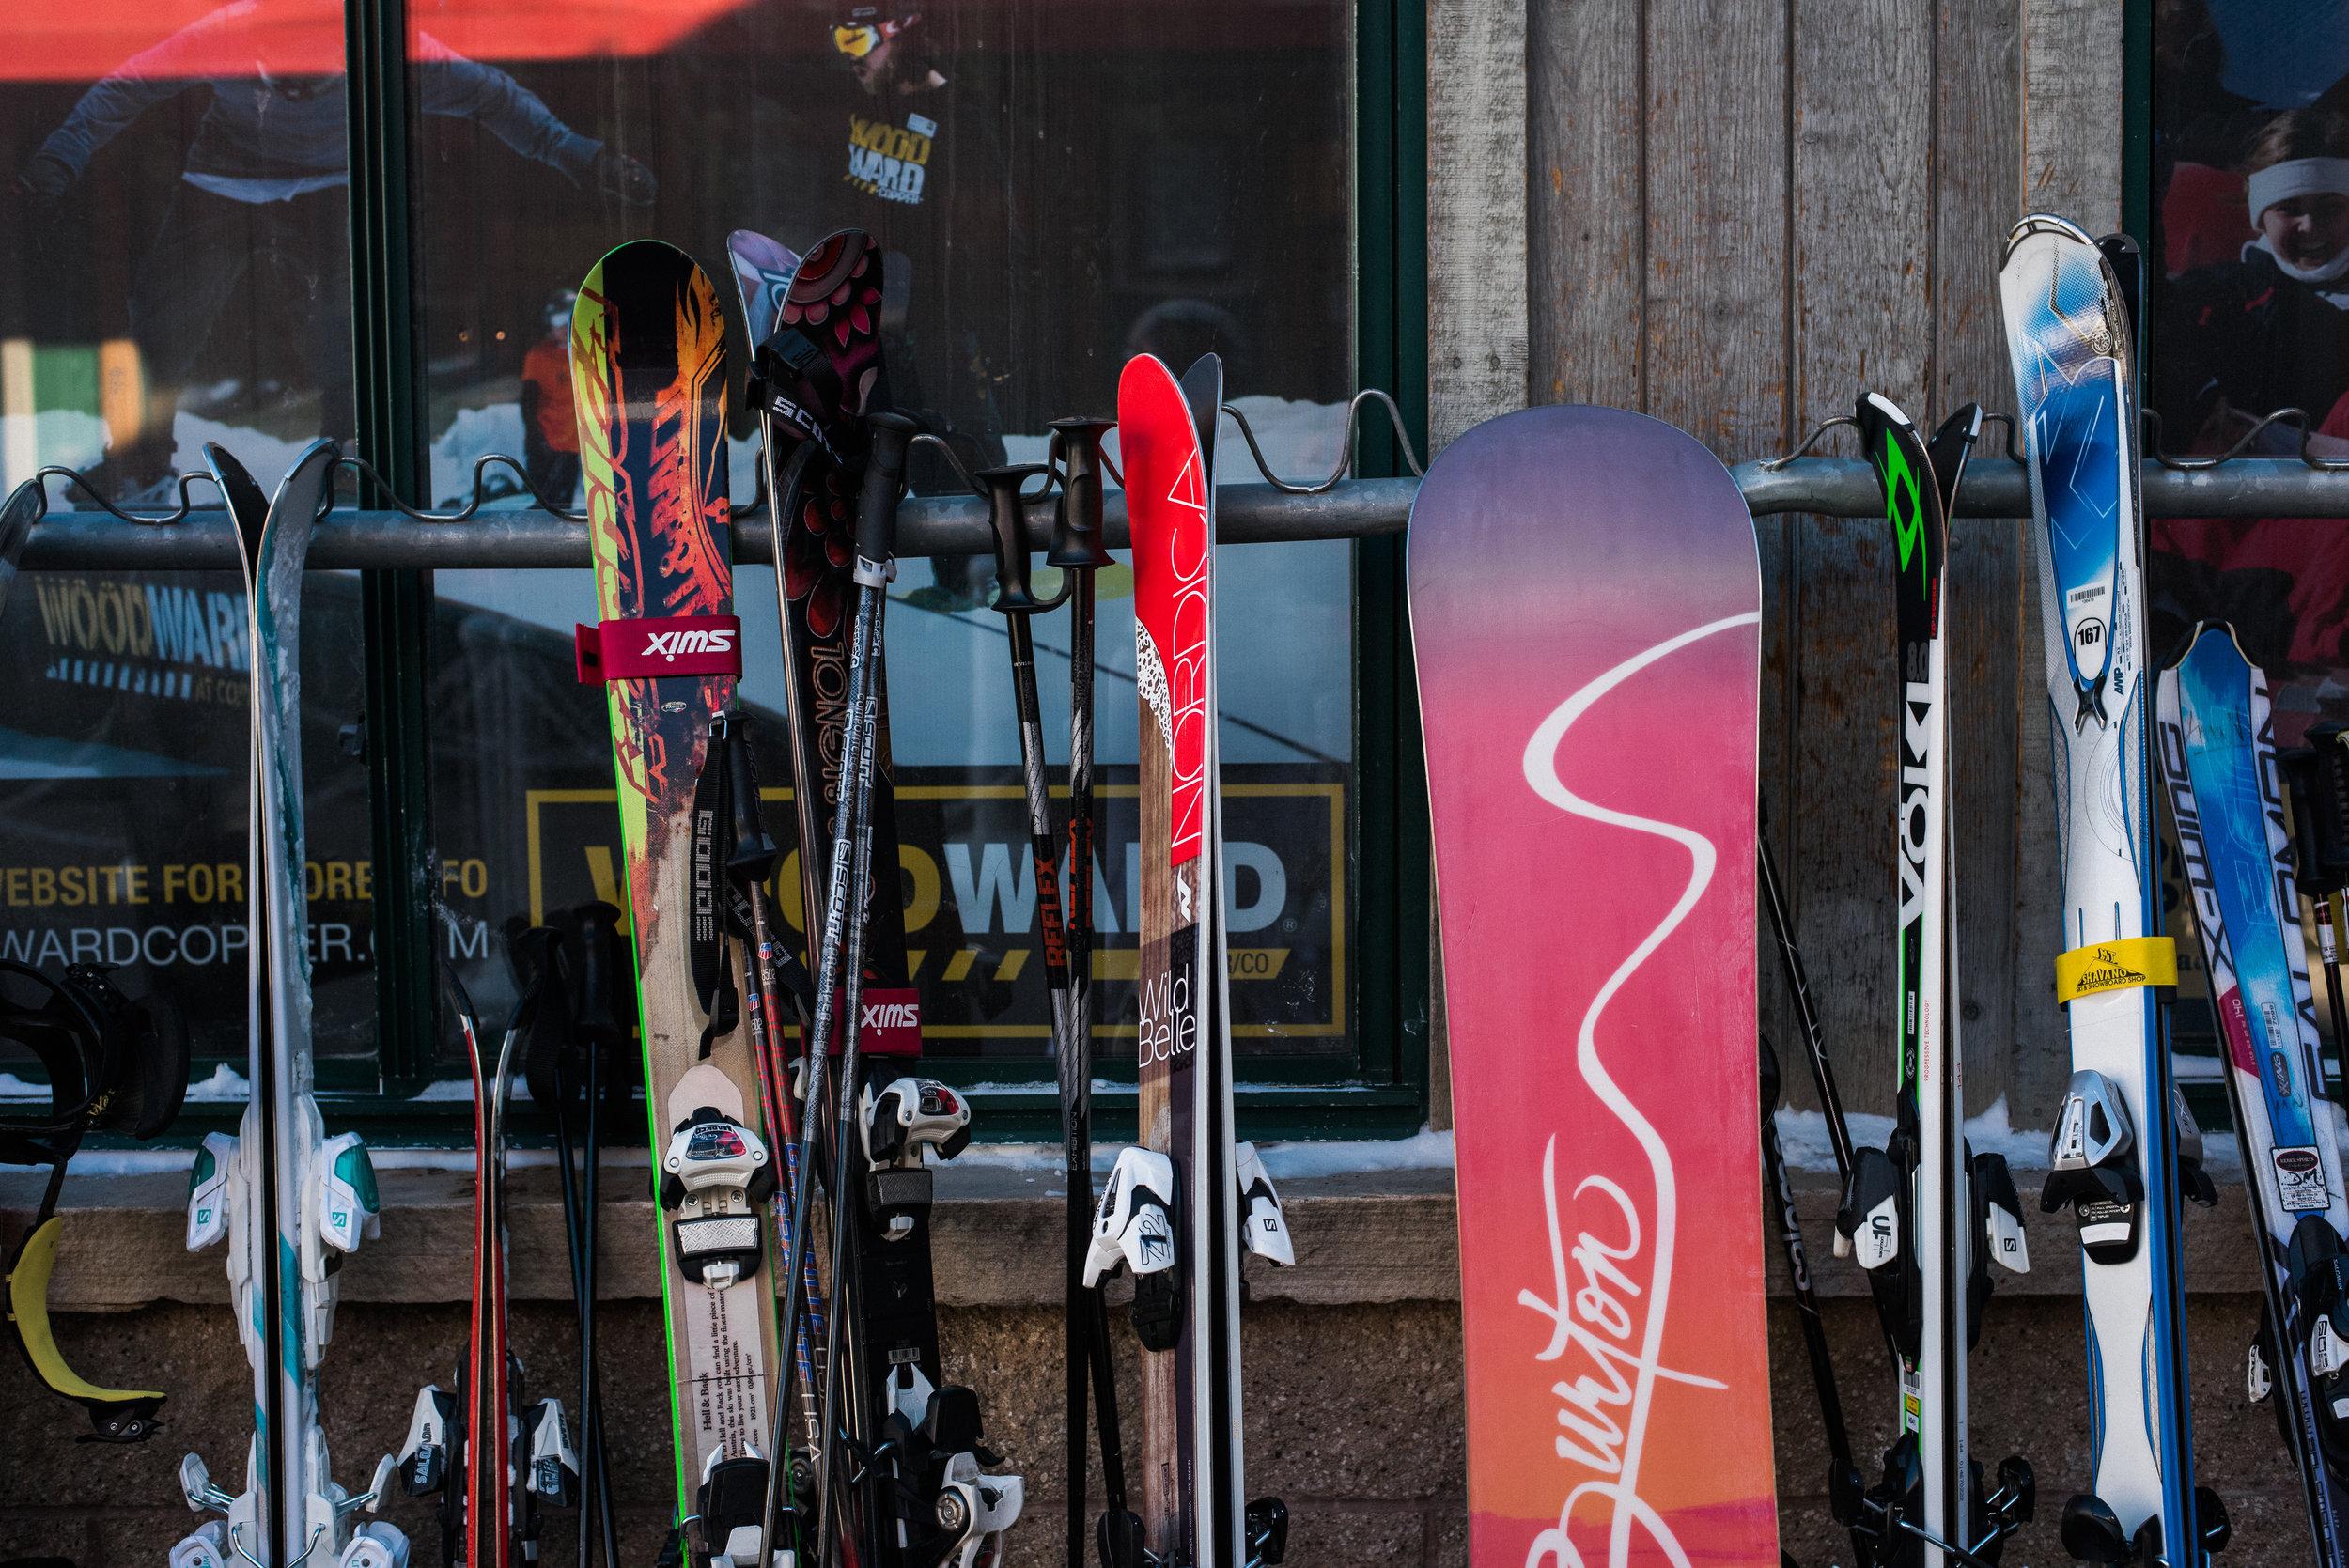 TaraShupe_Outdoor_Photographer_Loweprobags_Colorado_Copper_Mountains_Ski_29.jpg